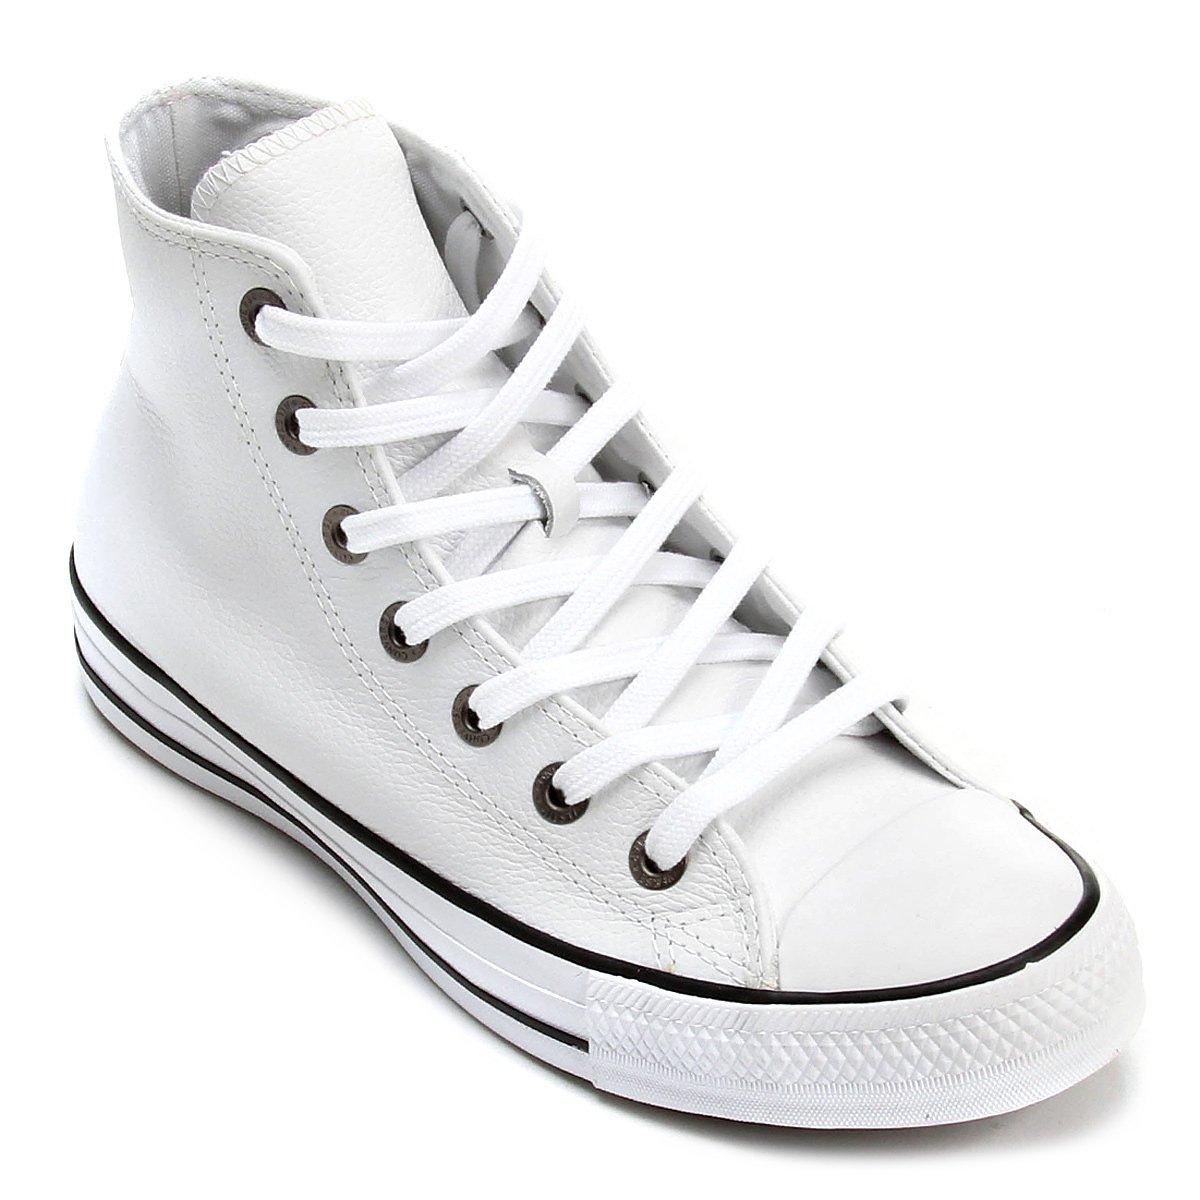 5834b319fb5 Tênis Couro Converse Chuck Taylor All Star HI - Branco e Preto - Compre  Agora